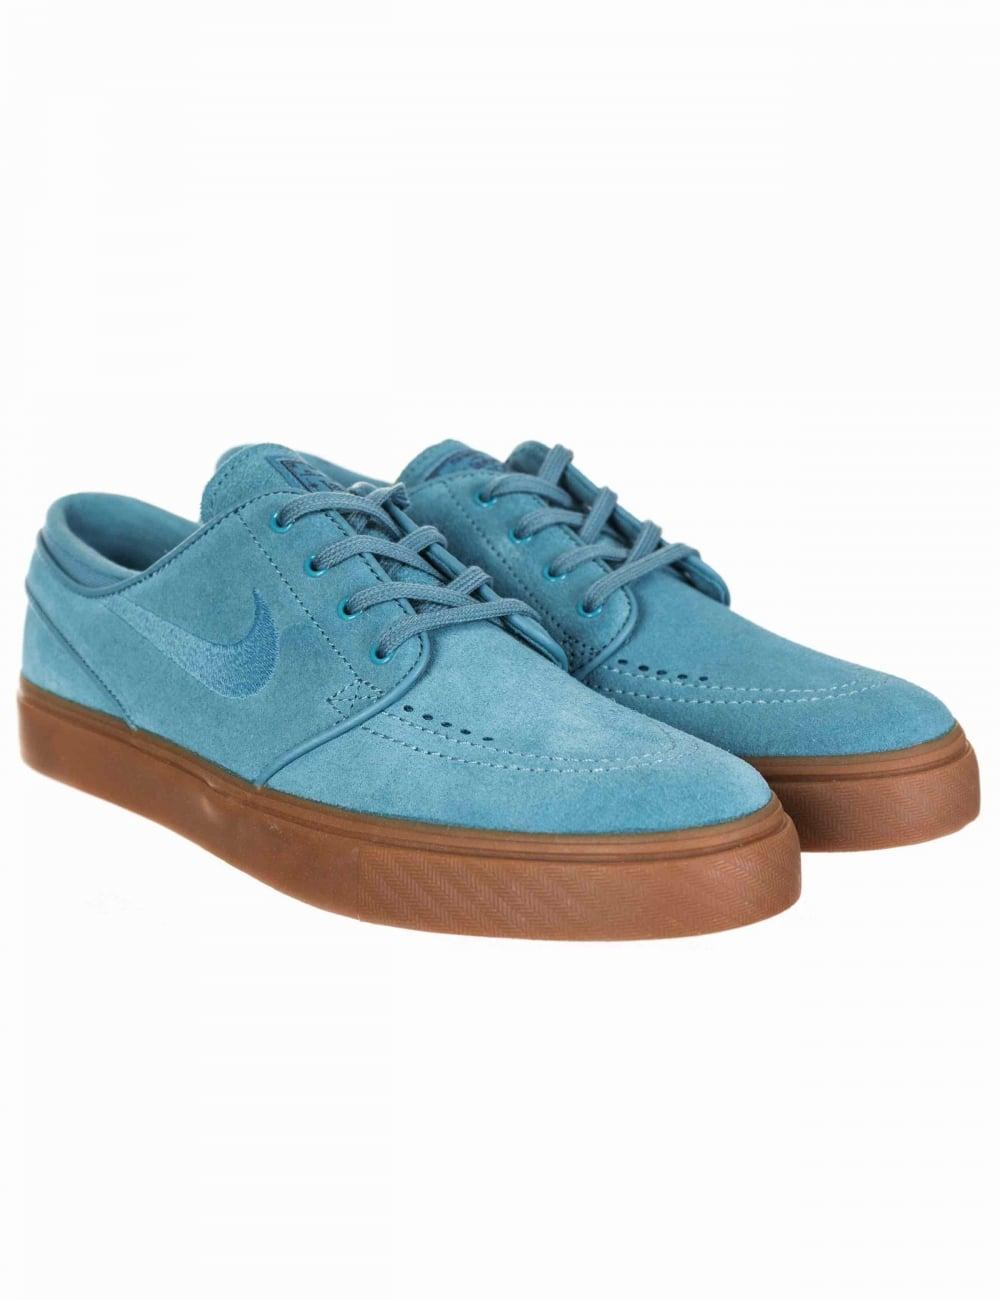 Nike SB Stefan Janoski Trainers - Noise Aqua Noise Aqua - Footwear ... 5d9496774bf5